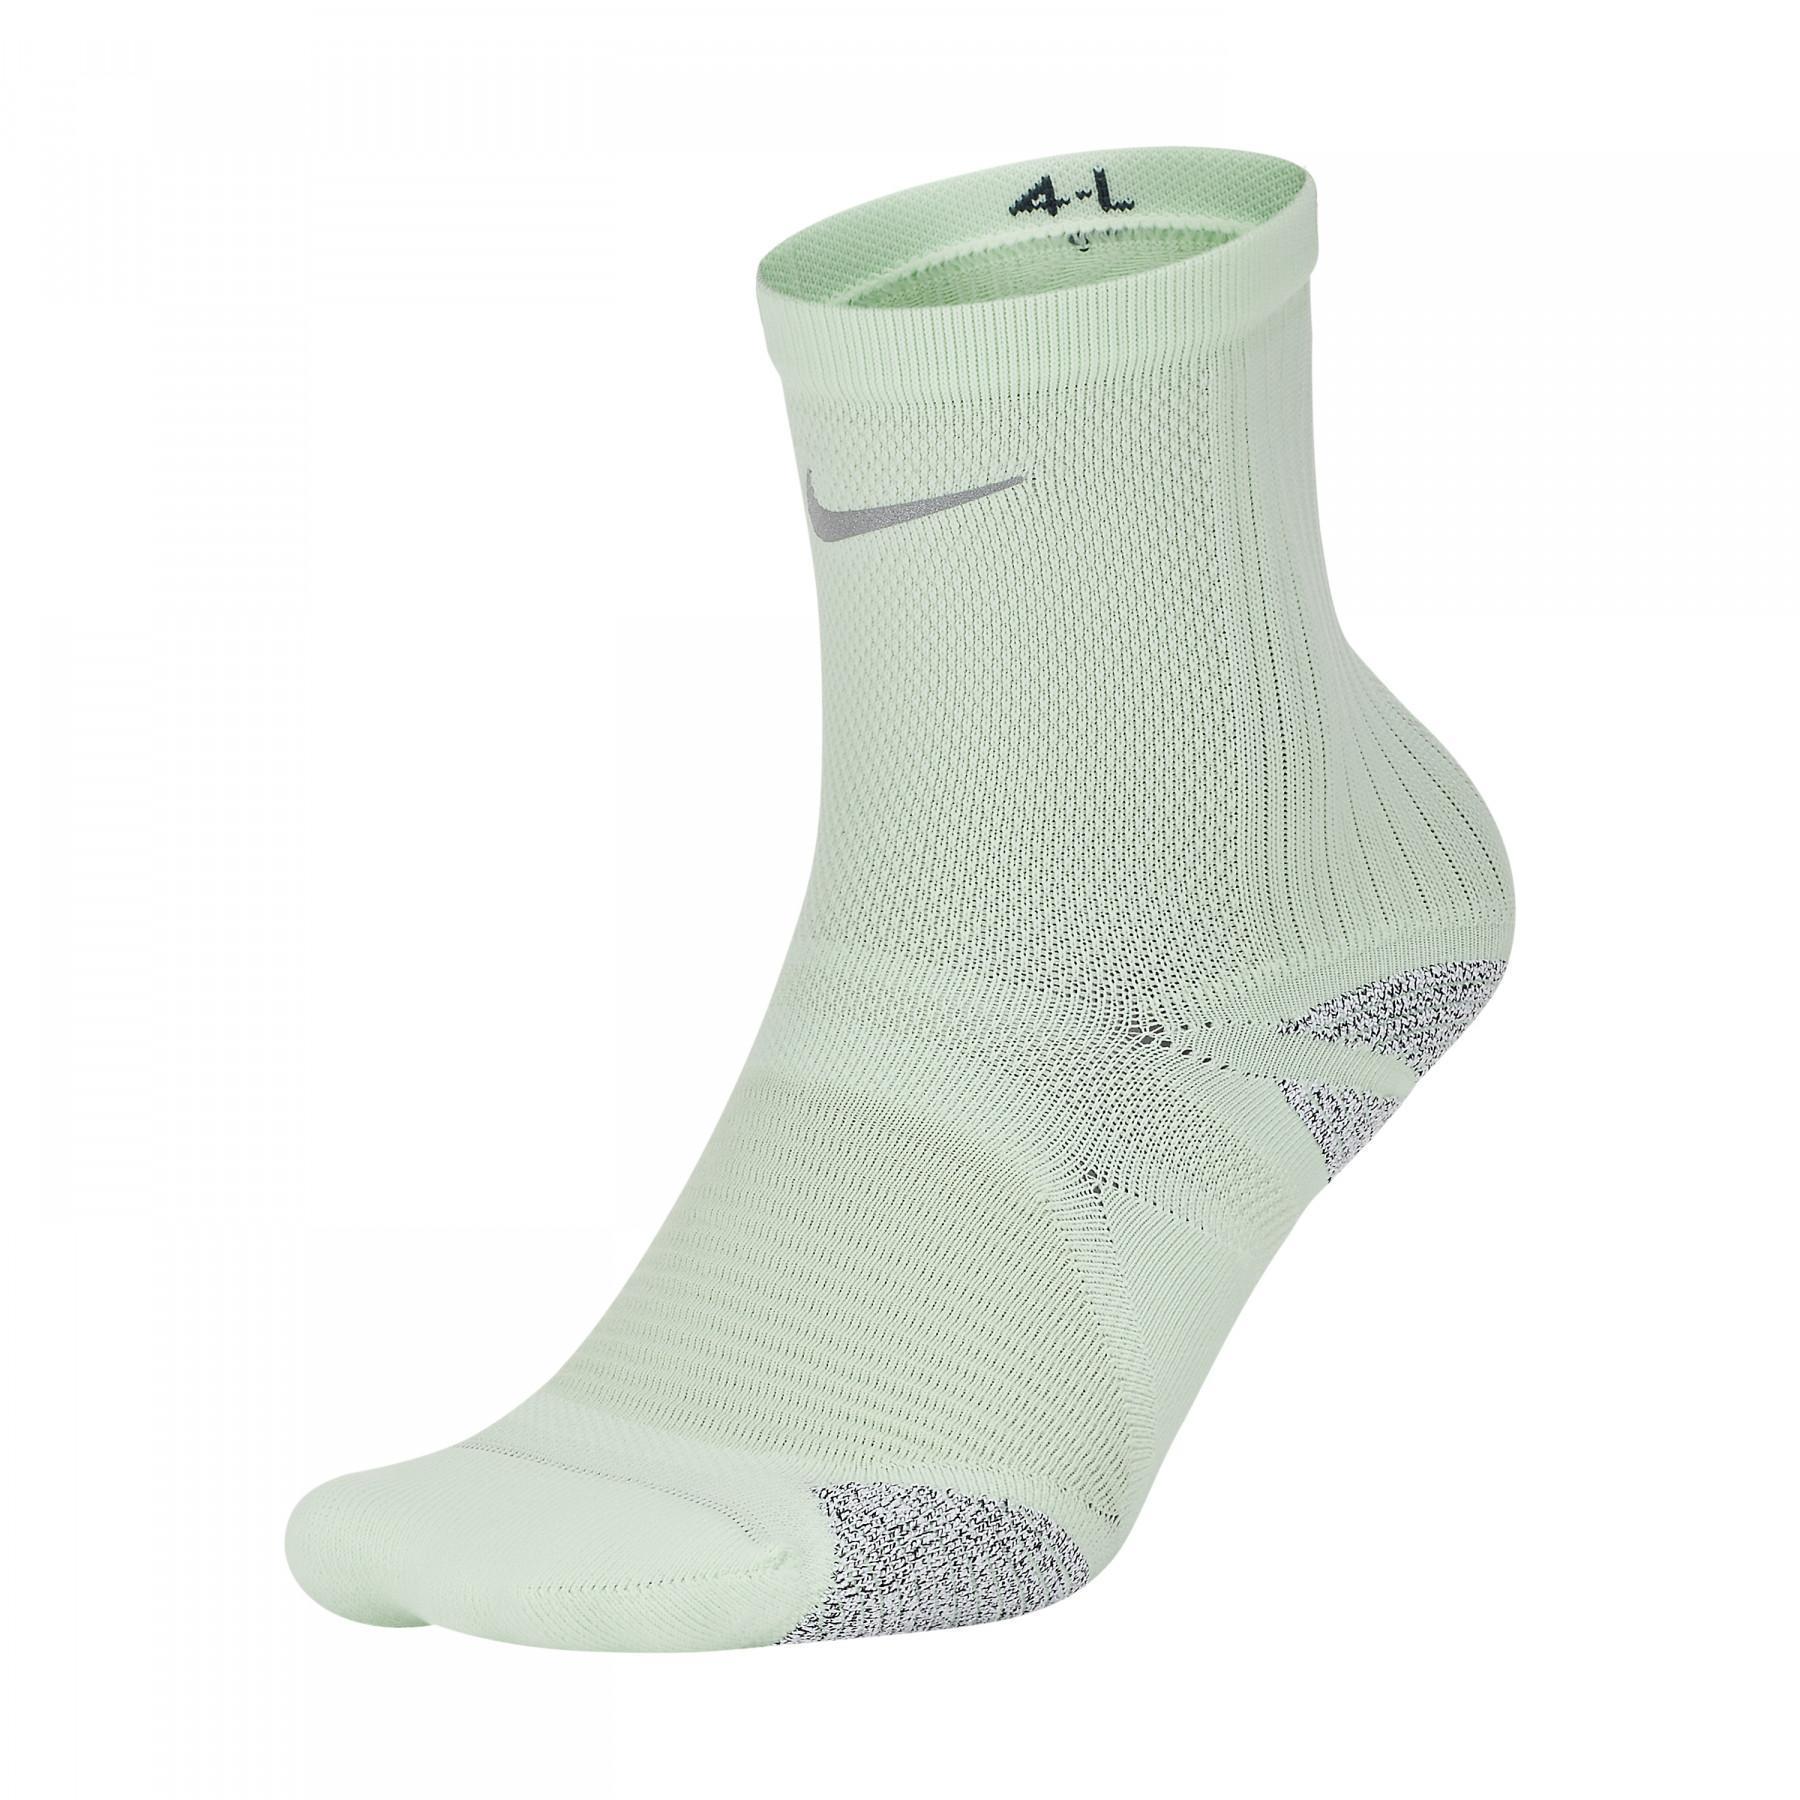 Nike Racing Socks